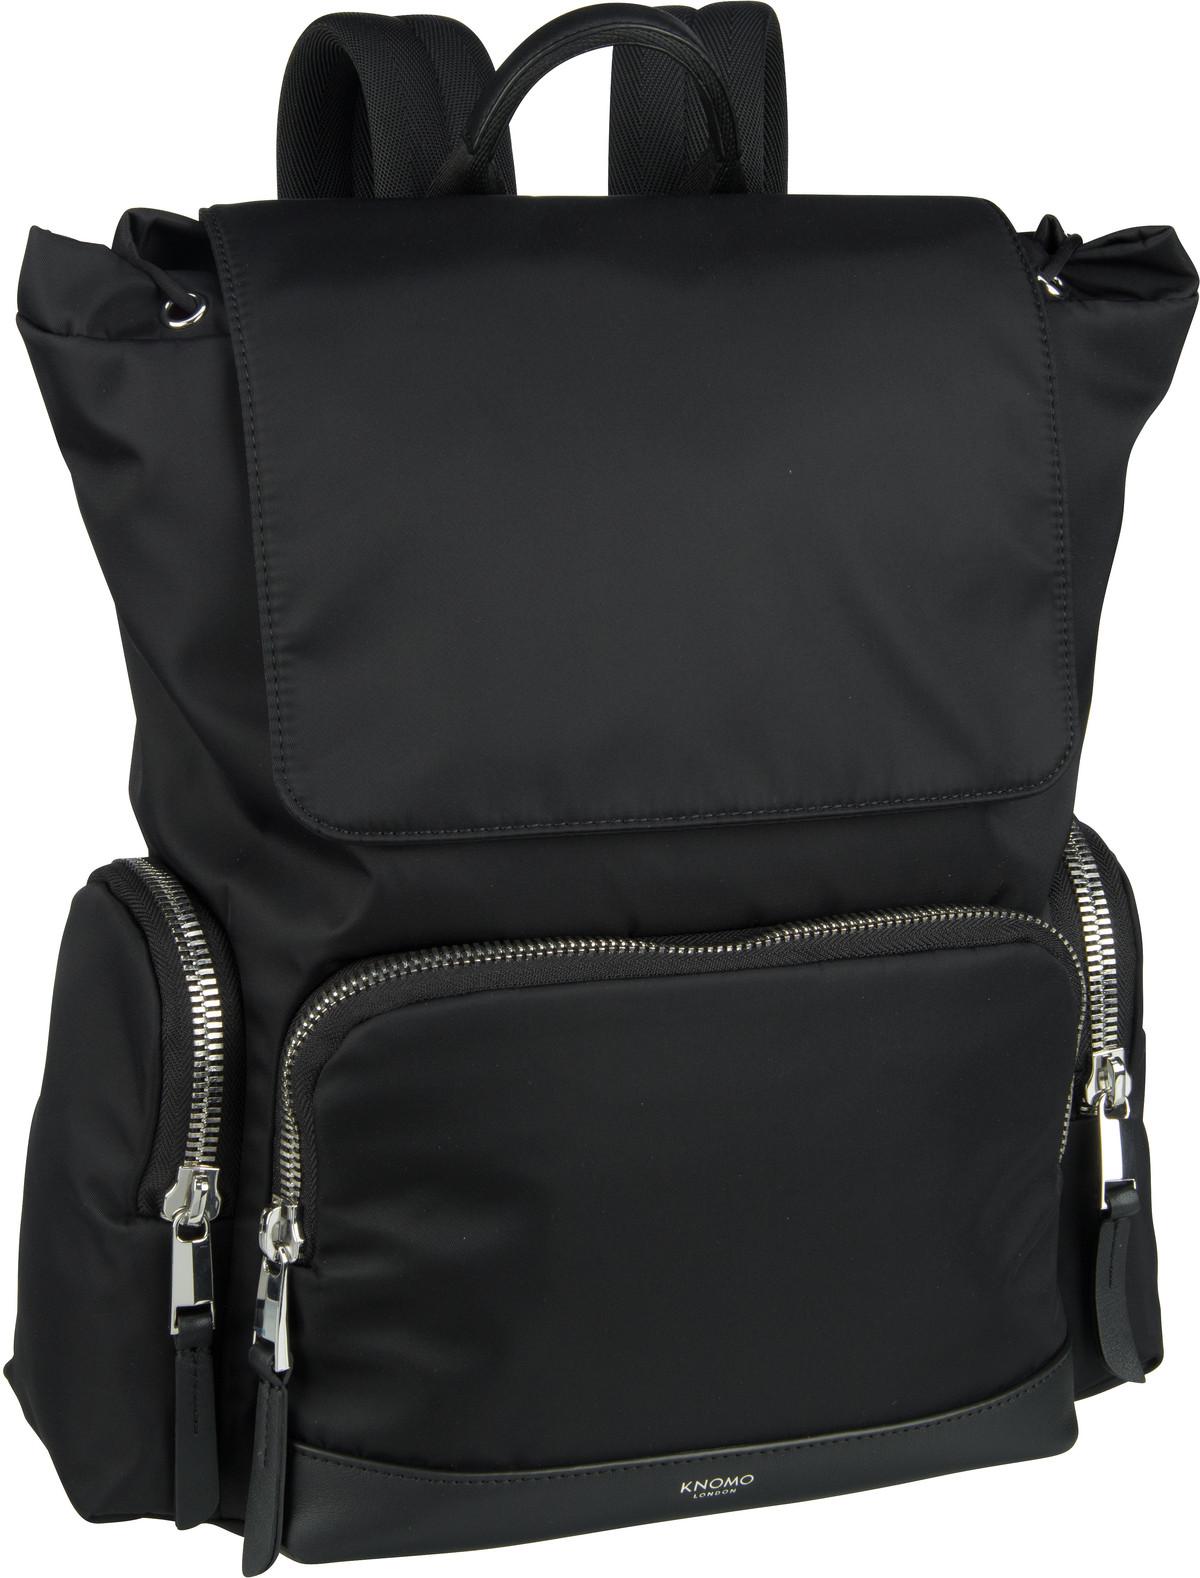 Rucksack / Daypack Mayfair Clifford 13'' Black/Silver (10 Liter)